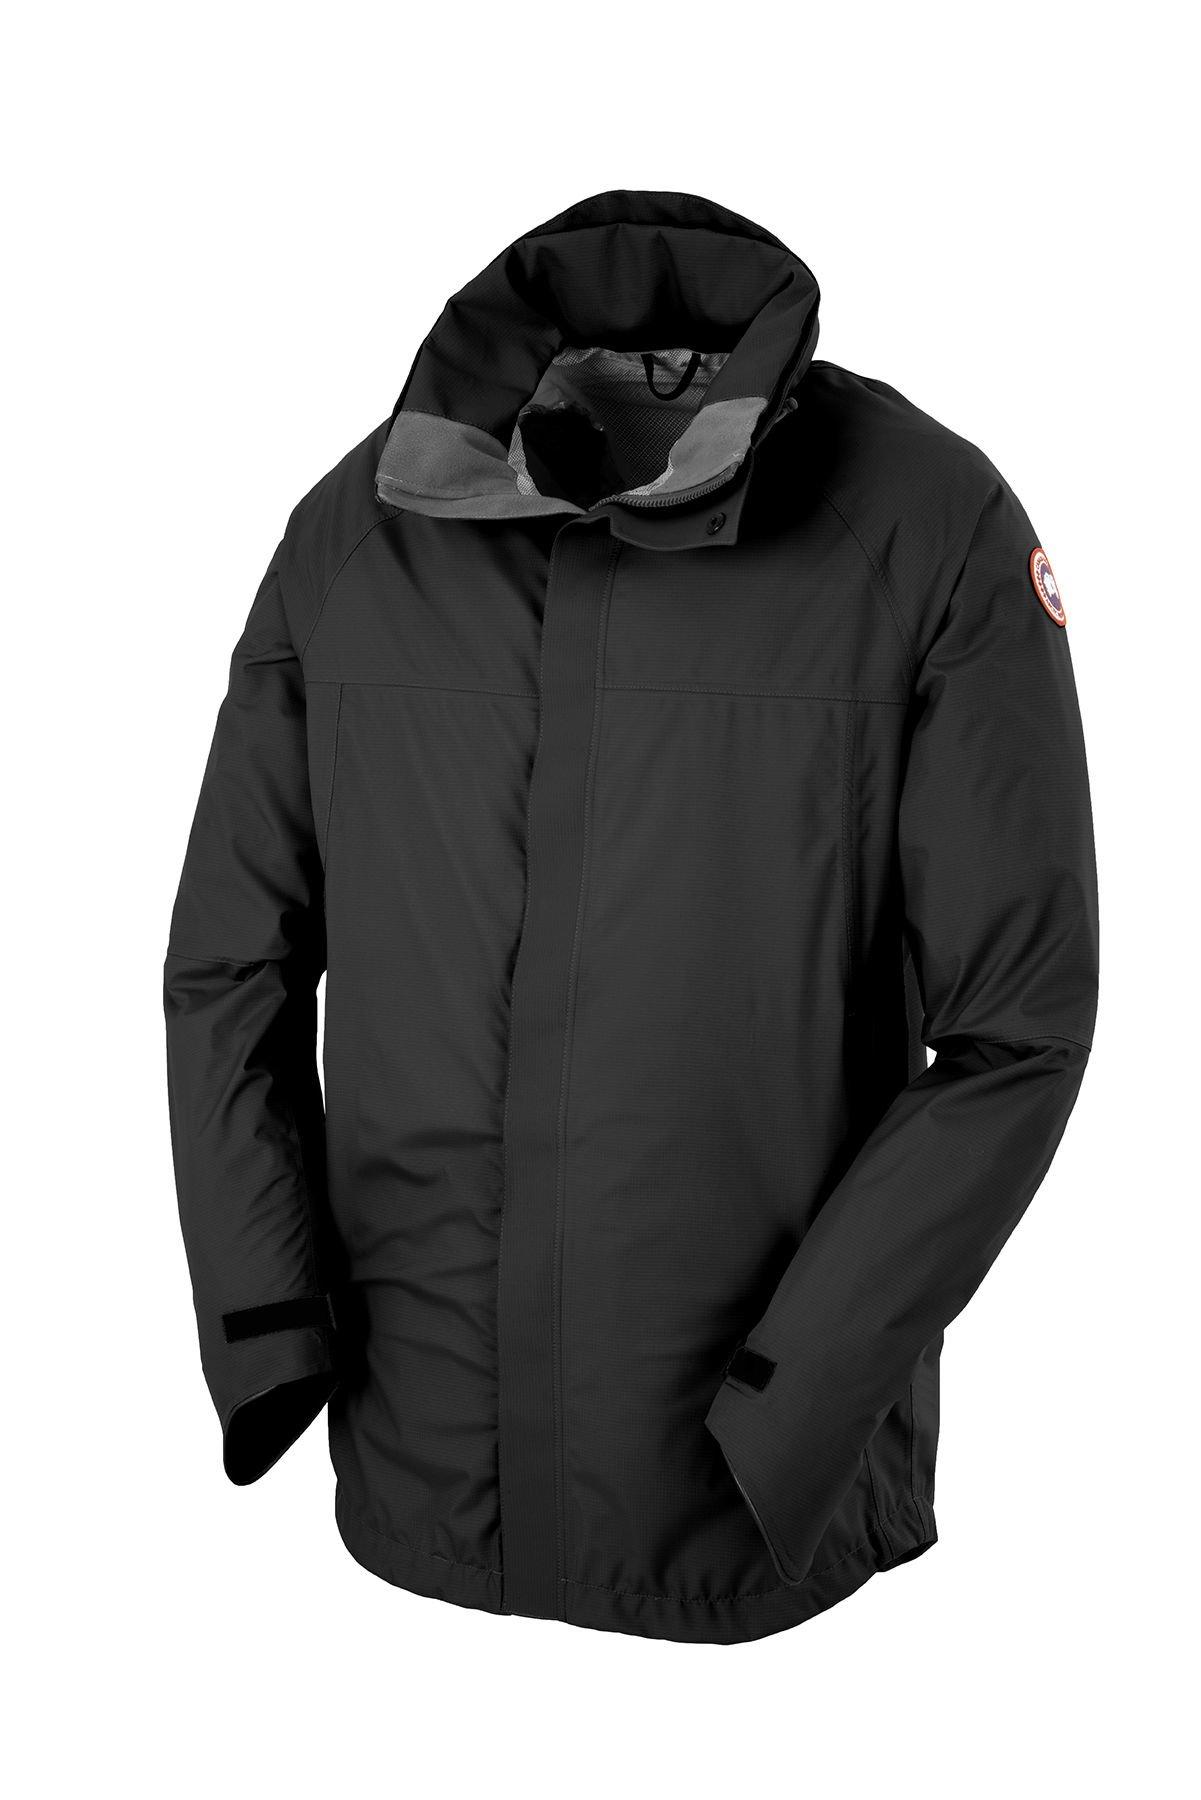 Canada Goose langford parka outlet 2016 - Canada goose Hayward Shell Jacket in Brown for Men (black-graphite ...